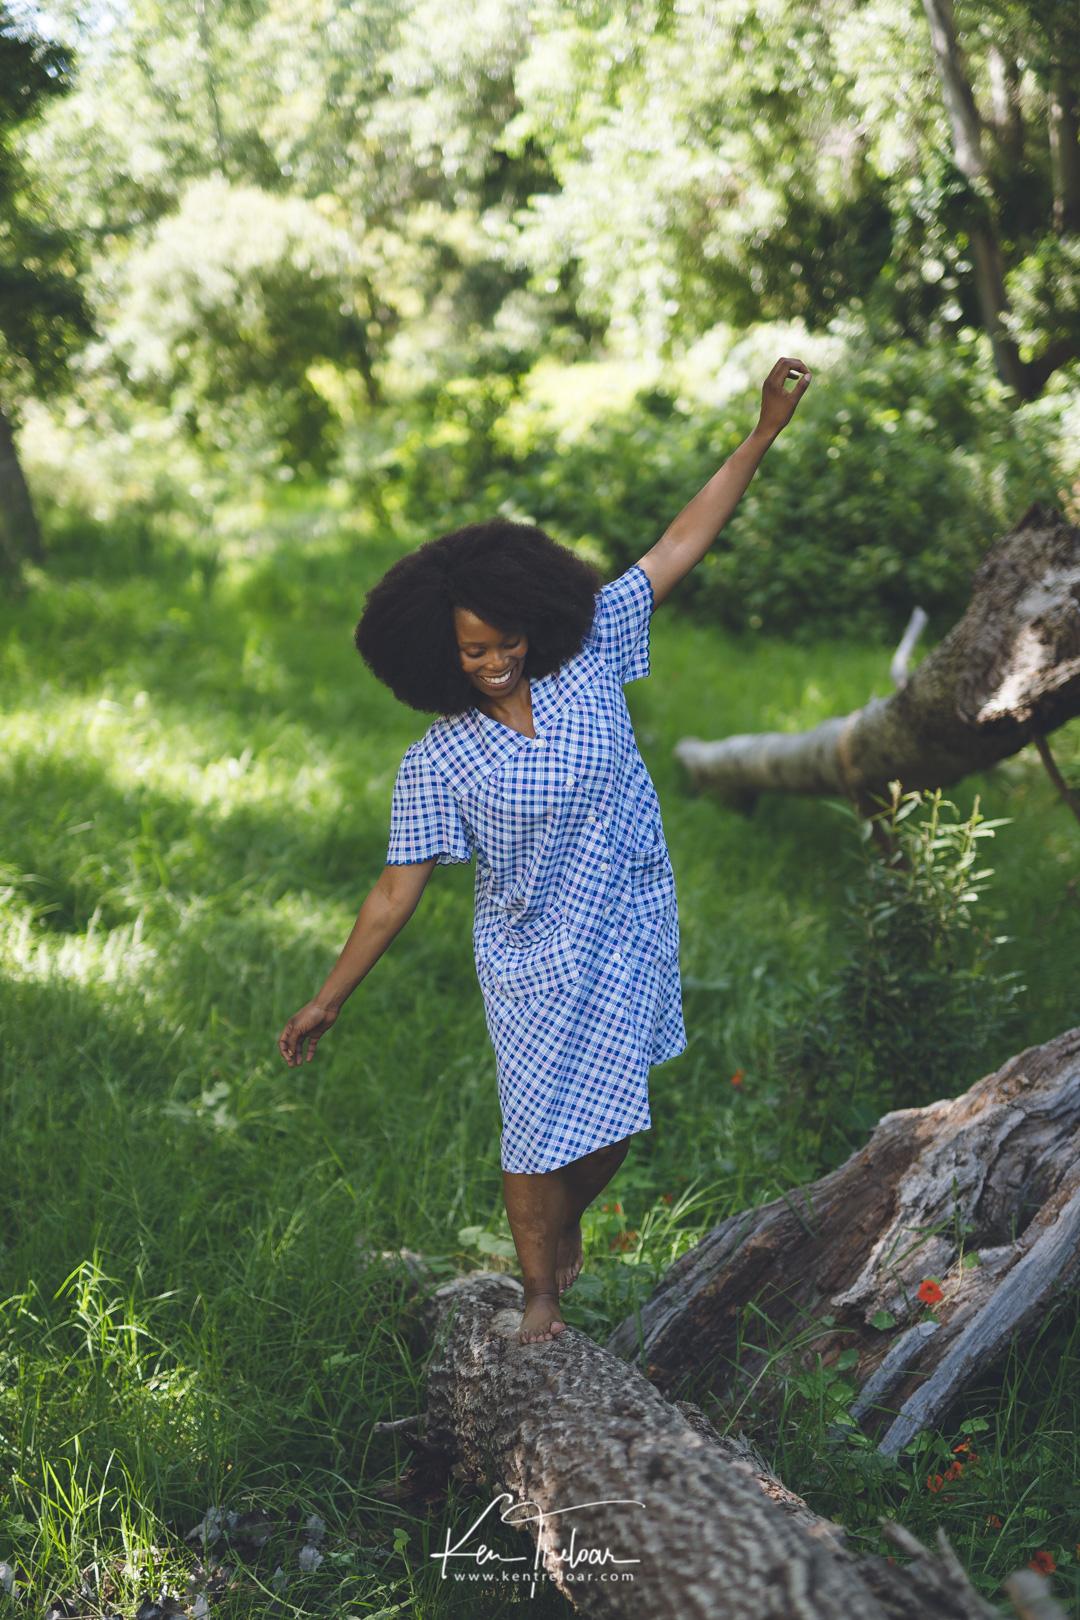 Ken Treloar Photography - Natural L-ight Editorial Portrait Fashion Photo Session - Cape Town Dec 2018-18.jpg